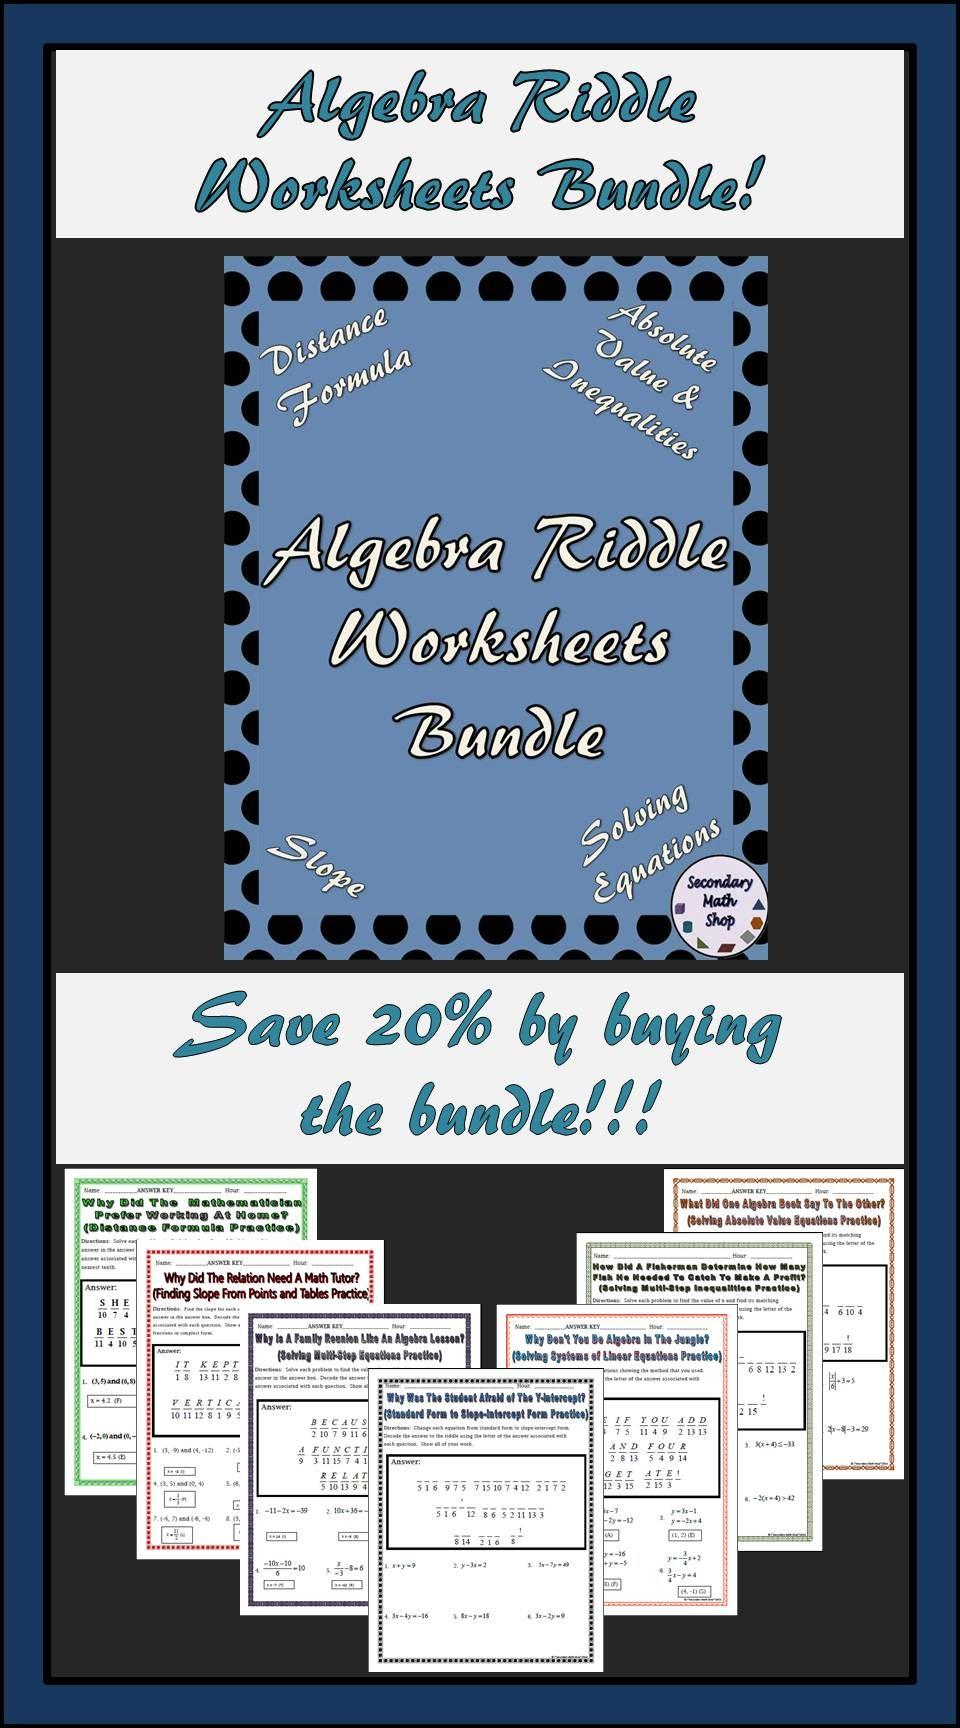 Algebra Riddle Worksheet Money Saving Bundle | Algebra, Worksheets ...